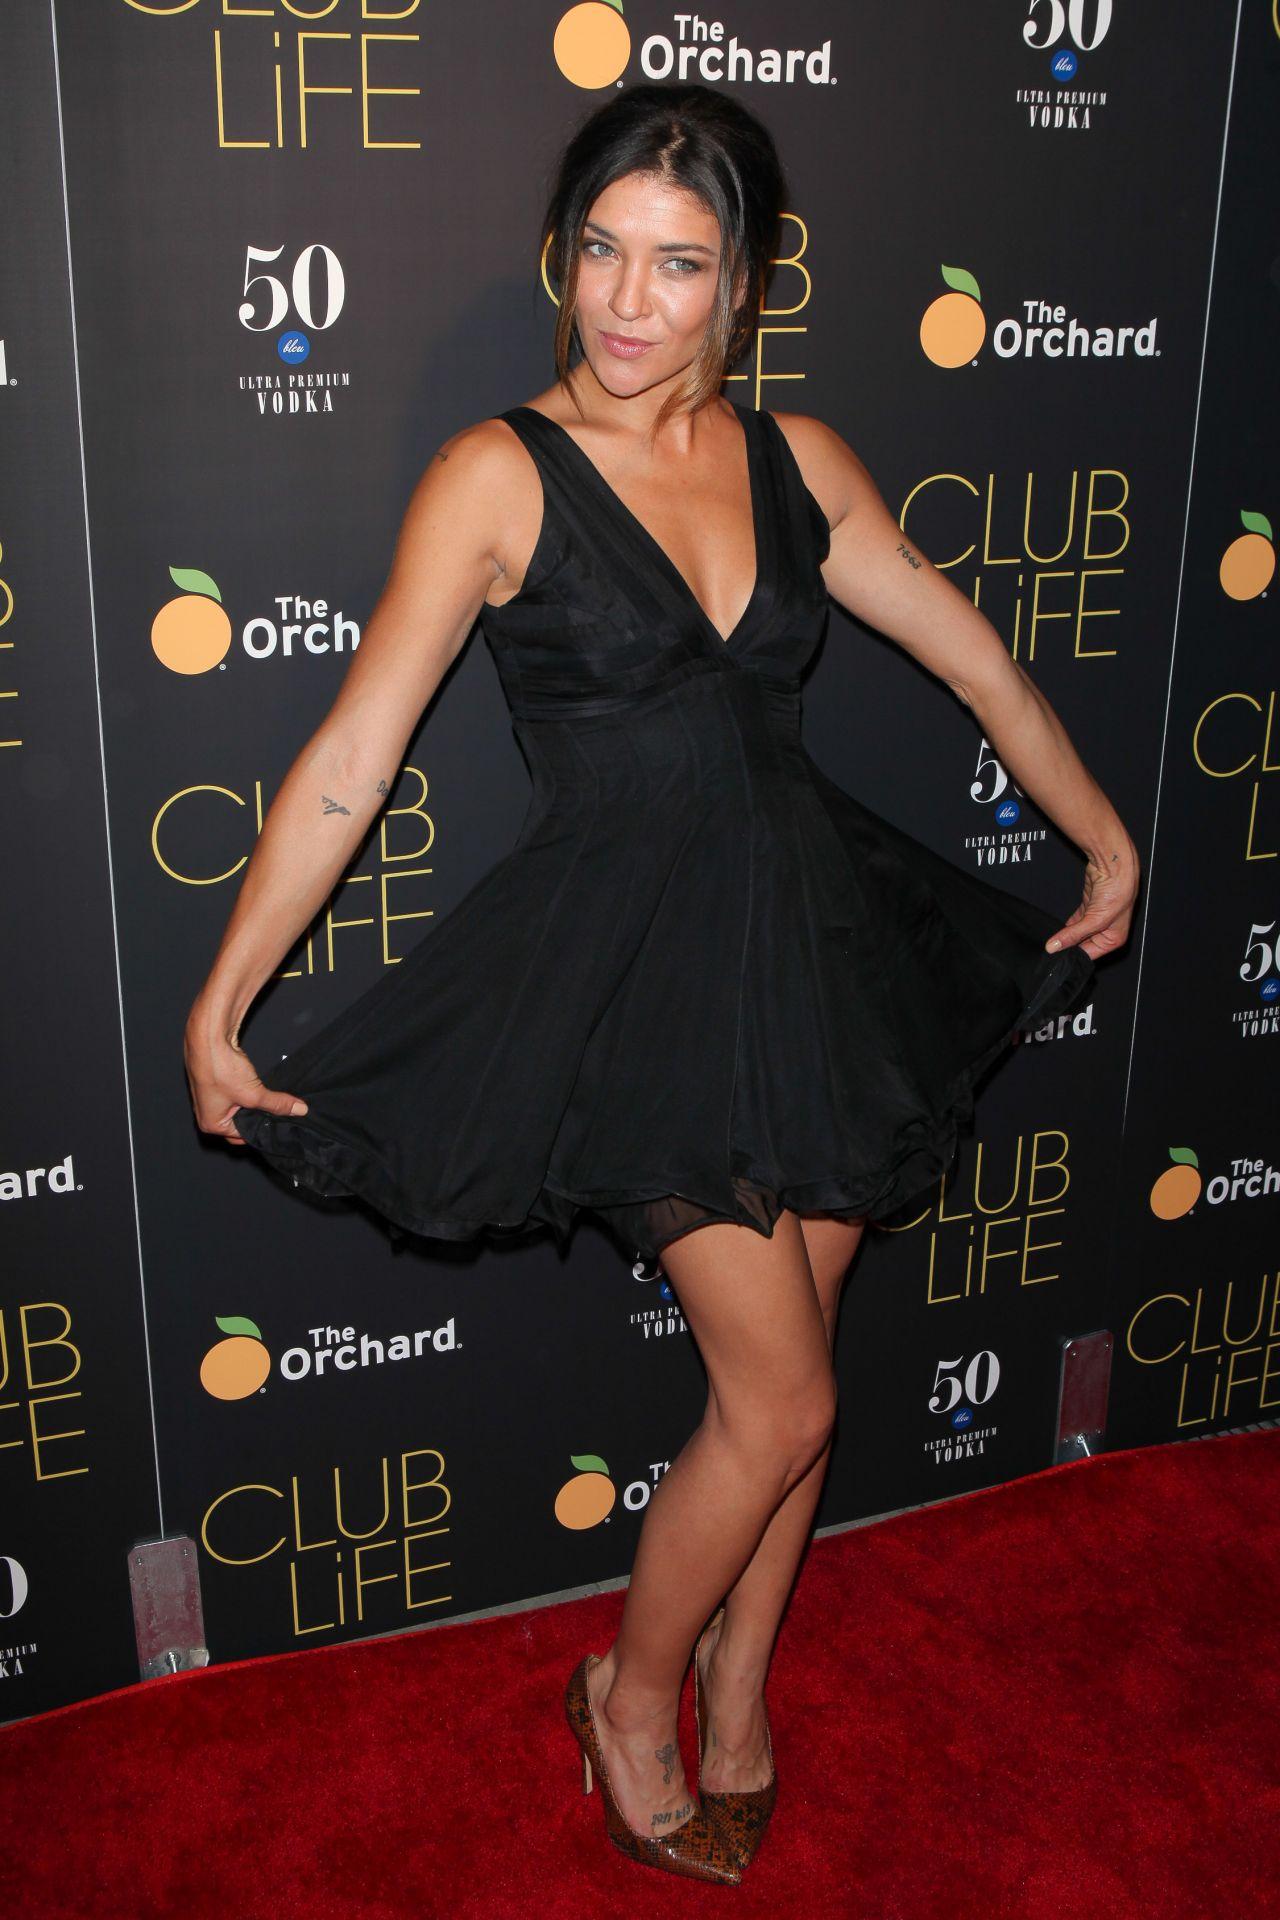 Jessica Szohr Club Life Premiere In New York City